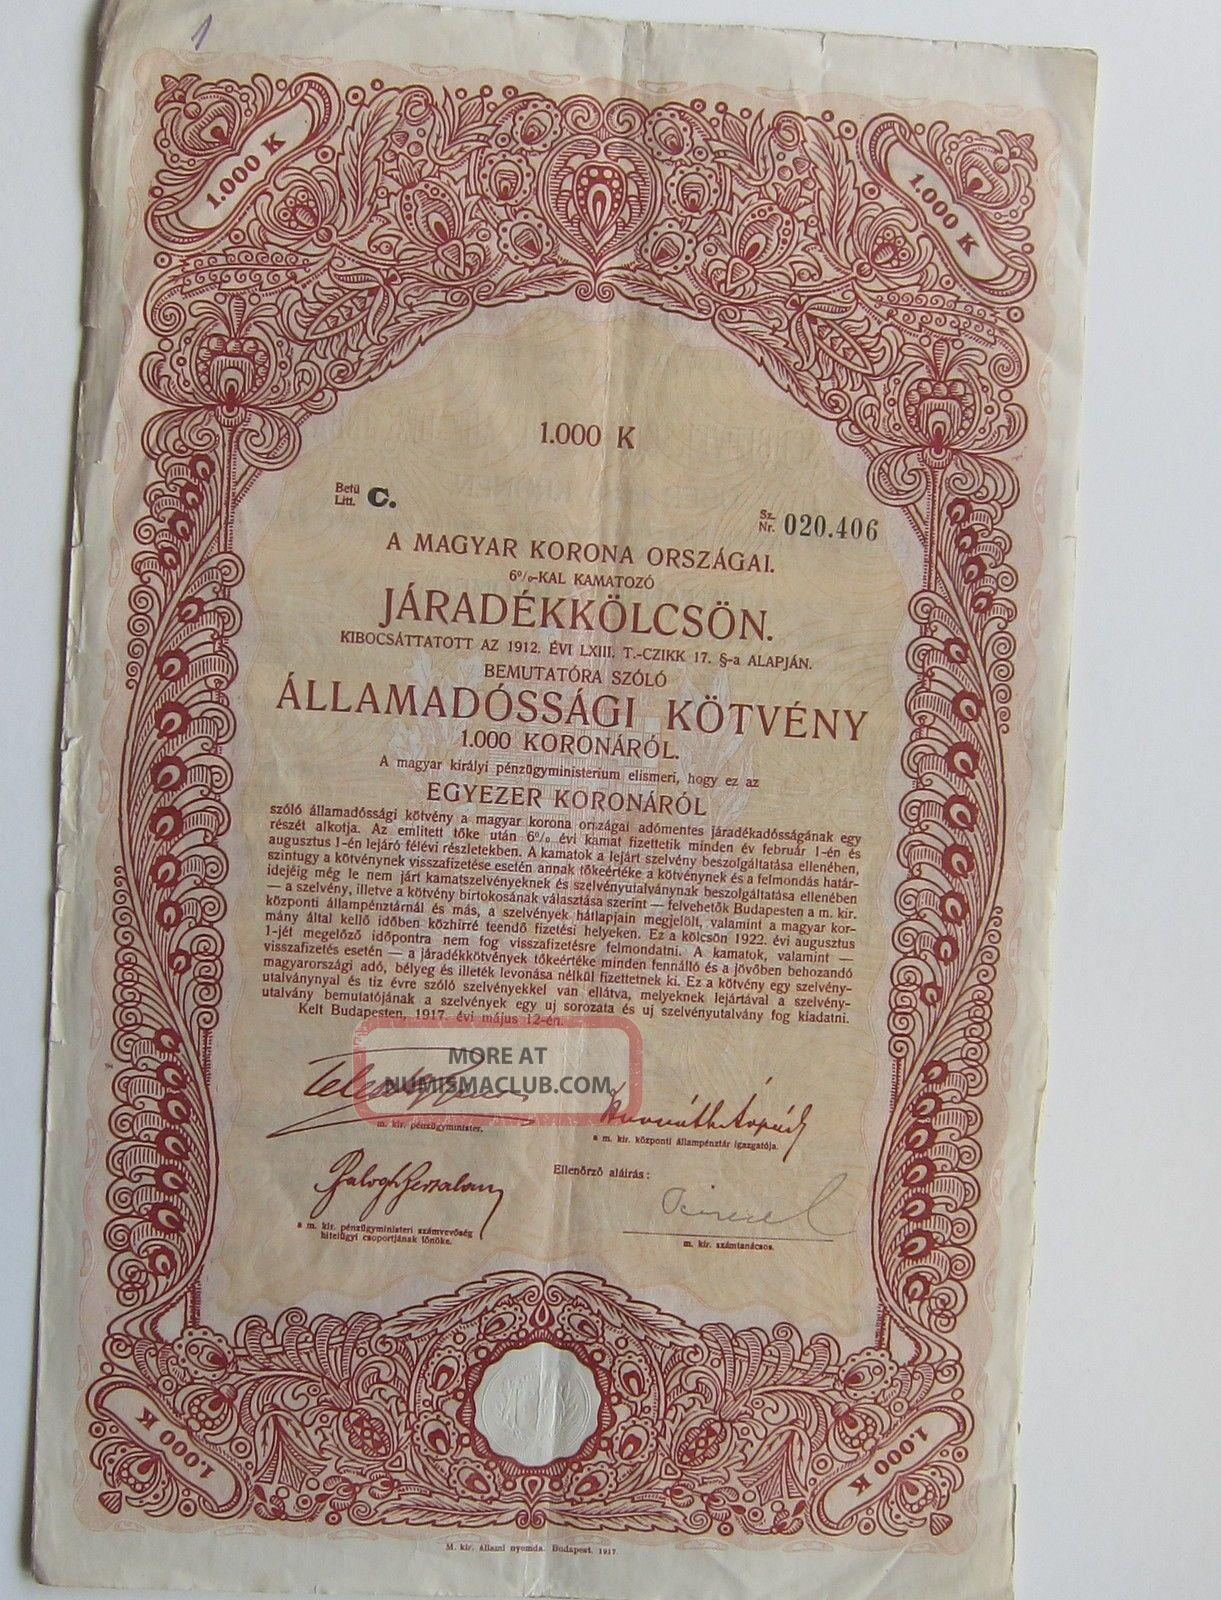 Kingdom Of Hungary 1912 State - Bond With Coupons Stocks & Bonds, Scripophily photo